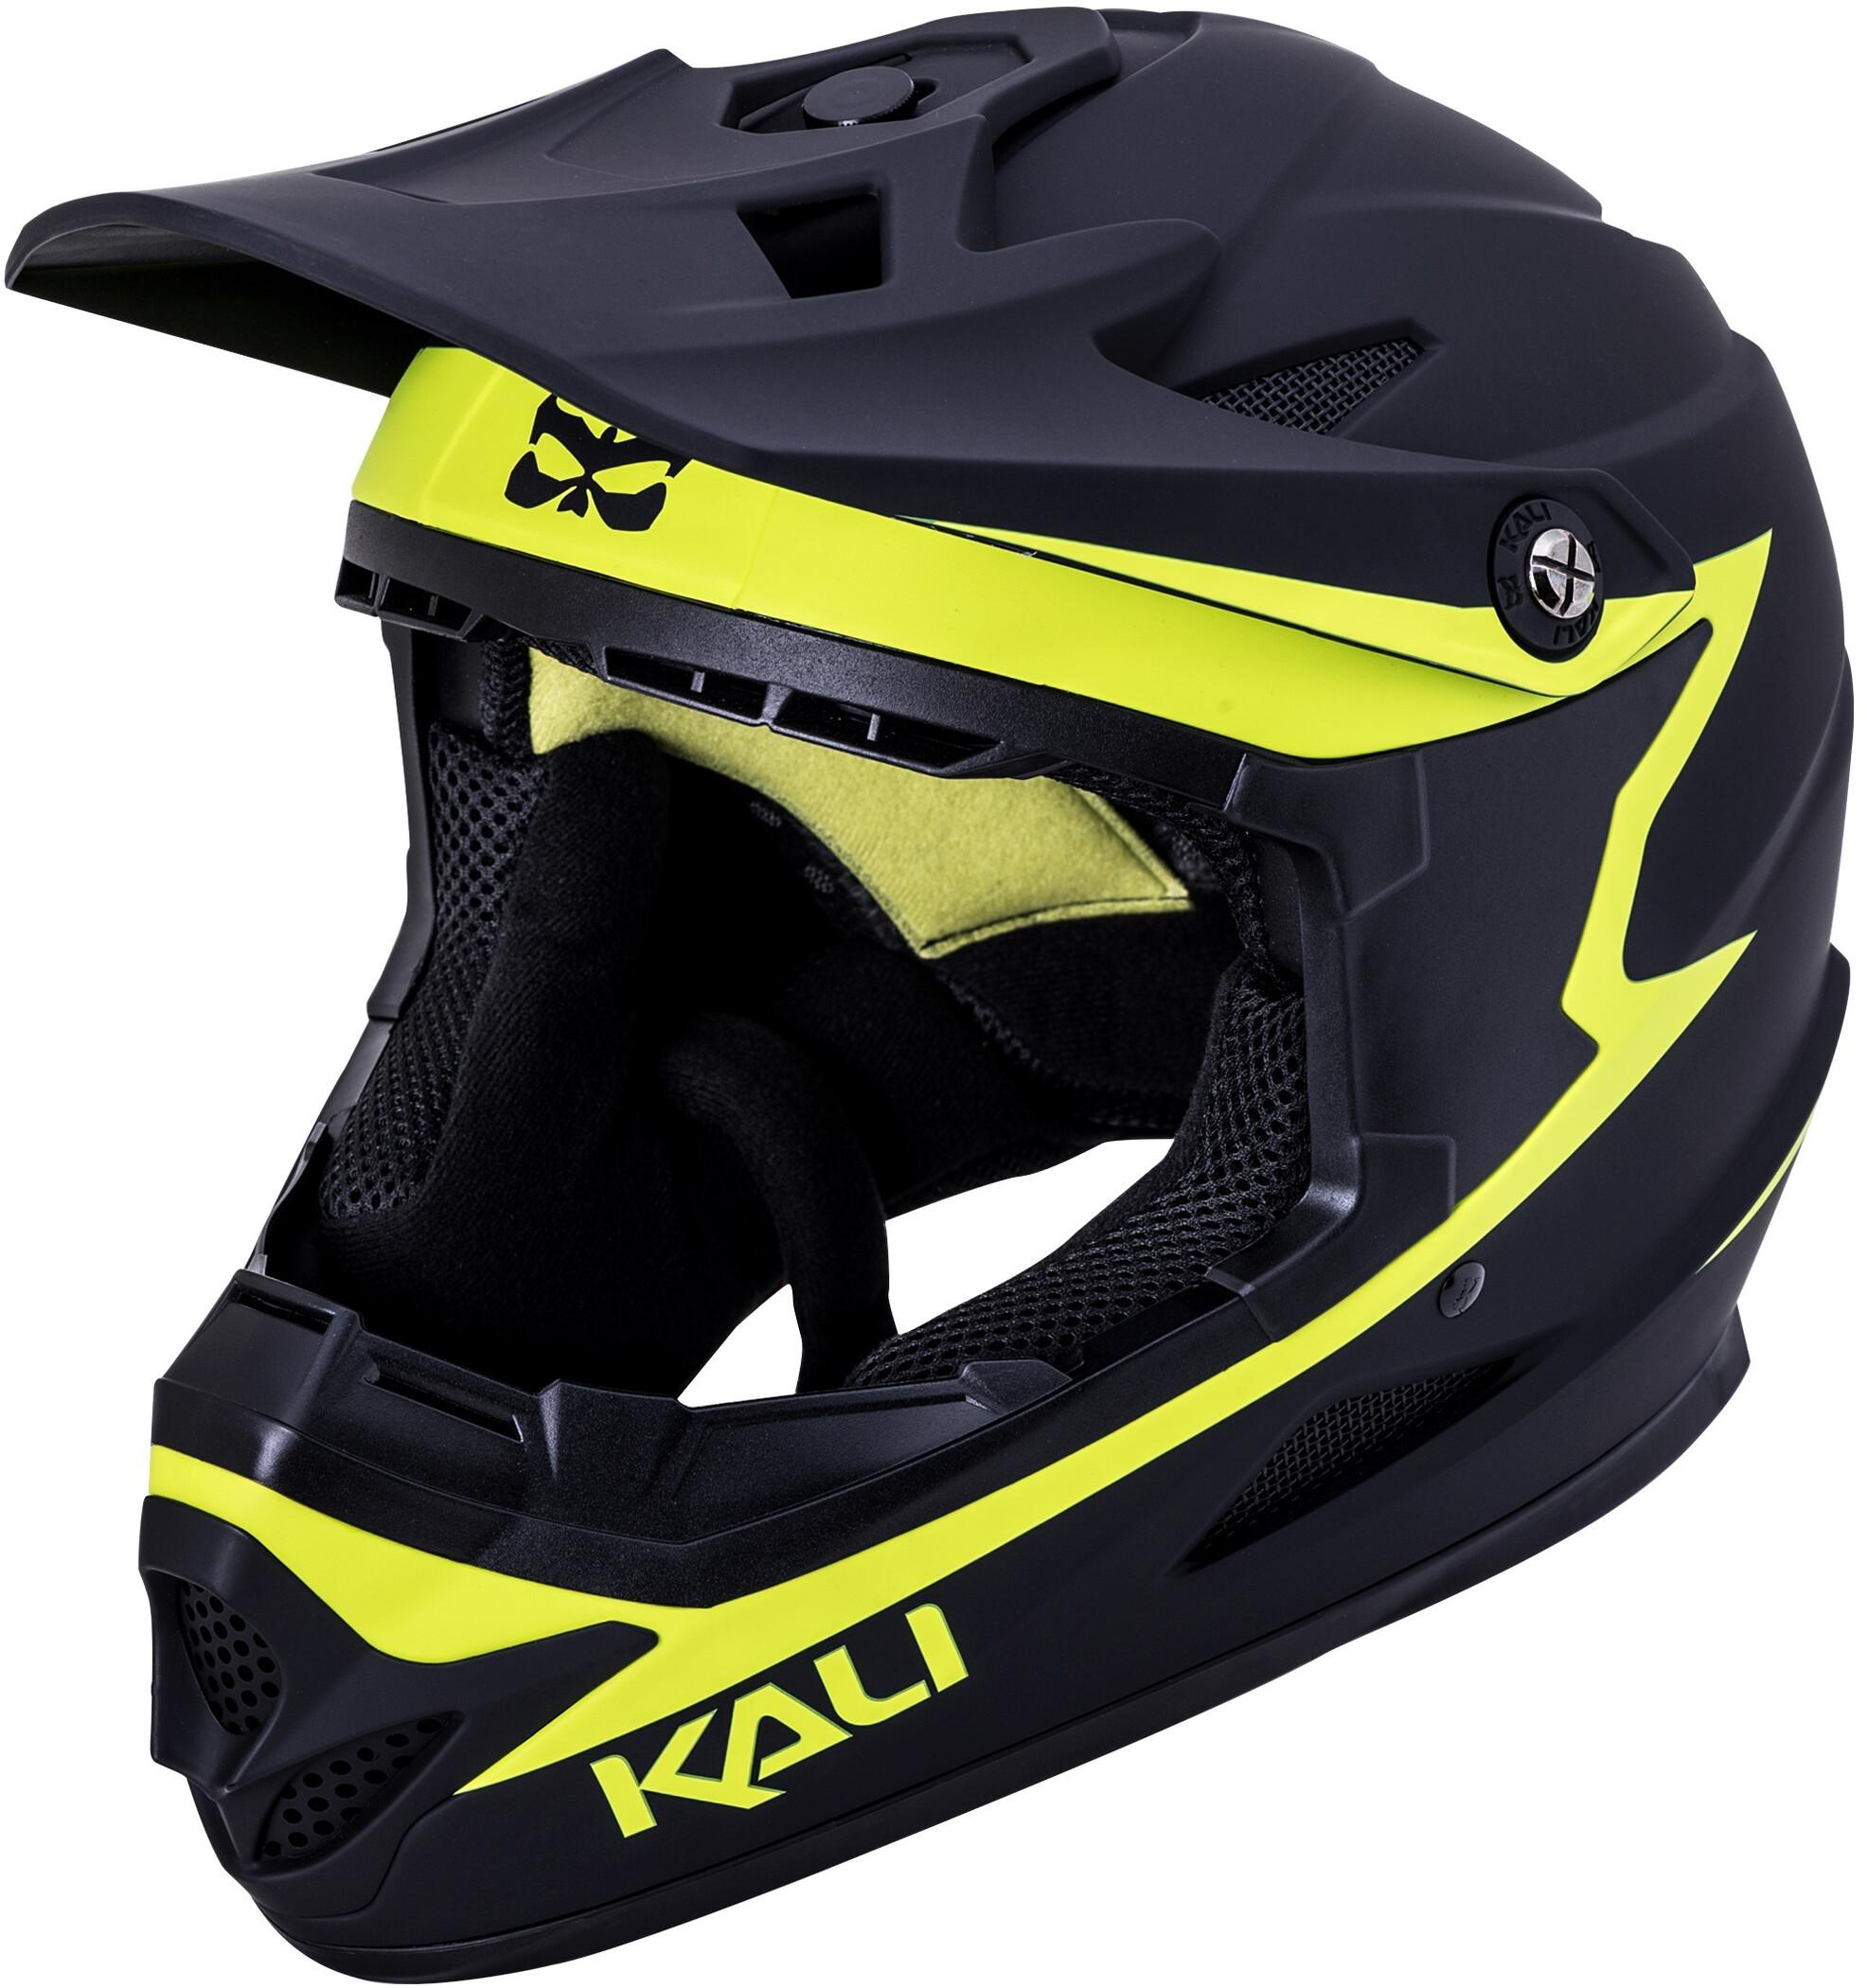 Kali Zoka Cykelhjelm Herrer, matte black/neon yellow   Hjelme